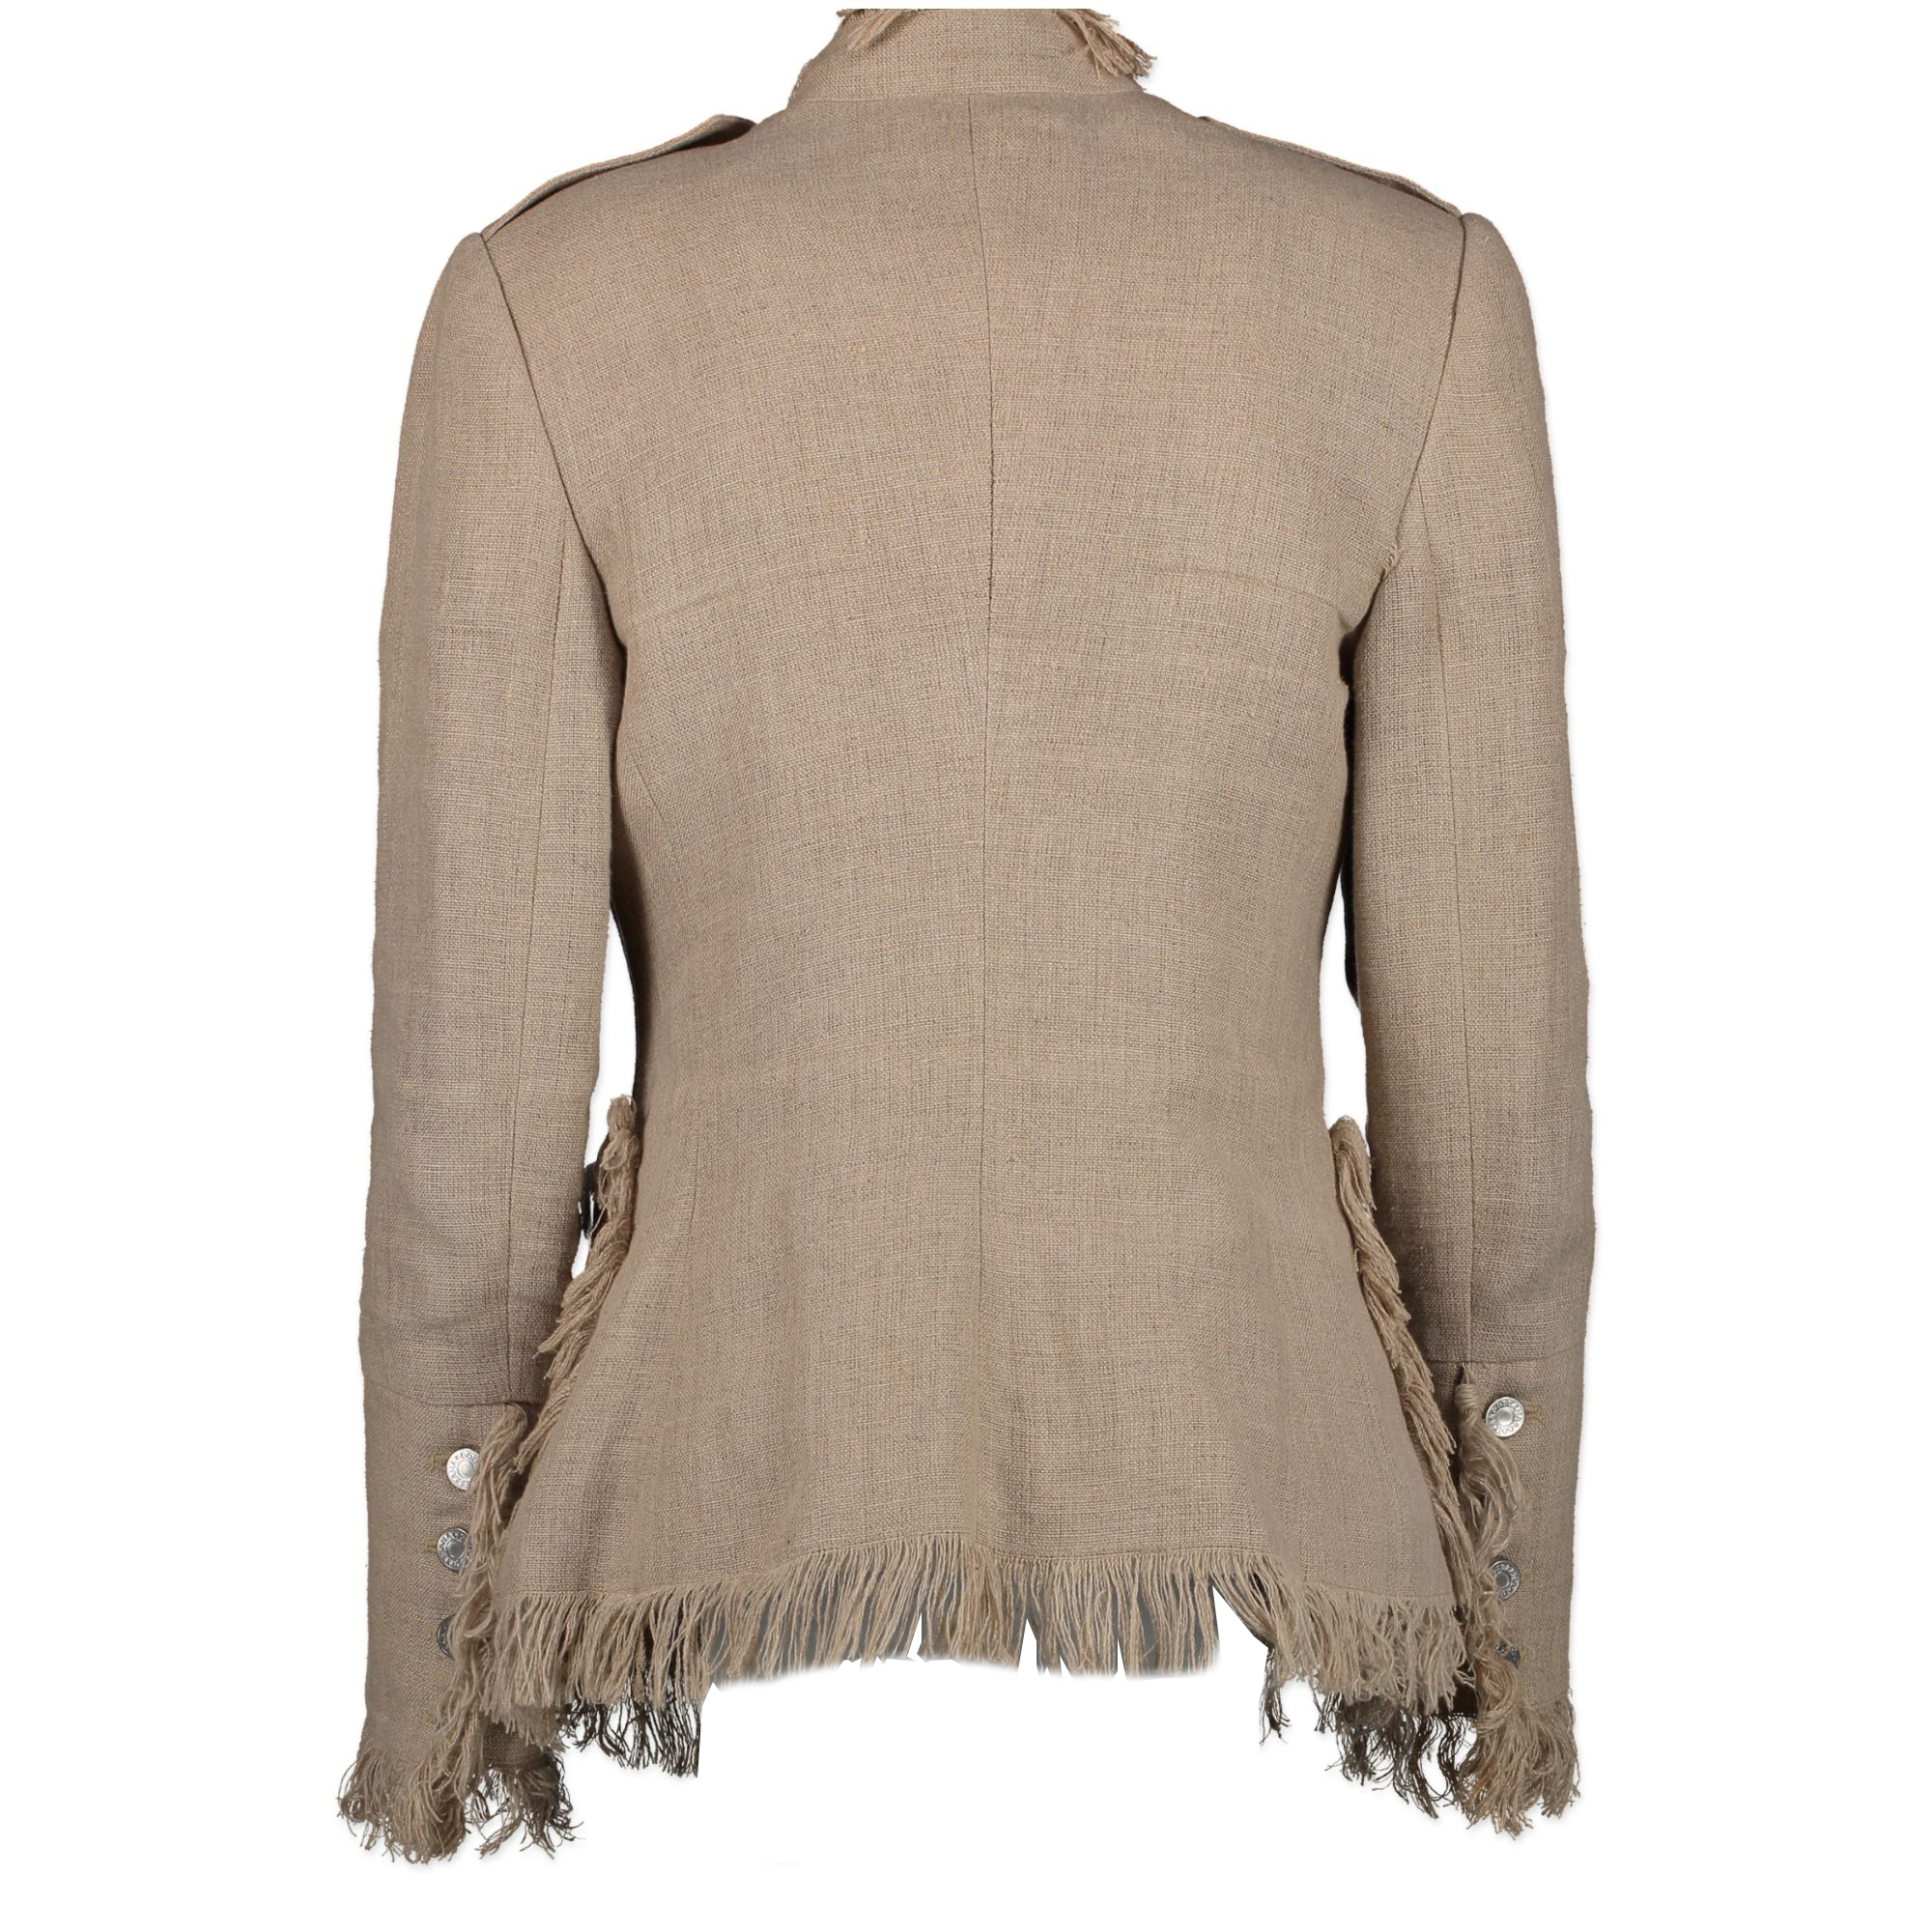 Dolce & Gabbana Beige Woven Linen Fringe Jacket